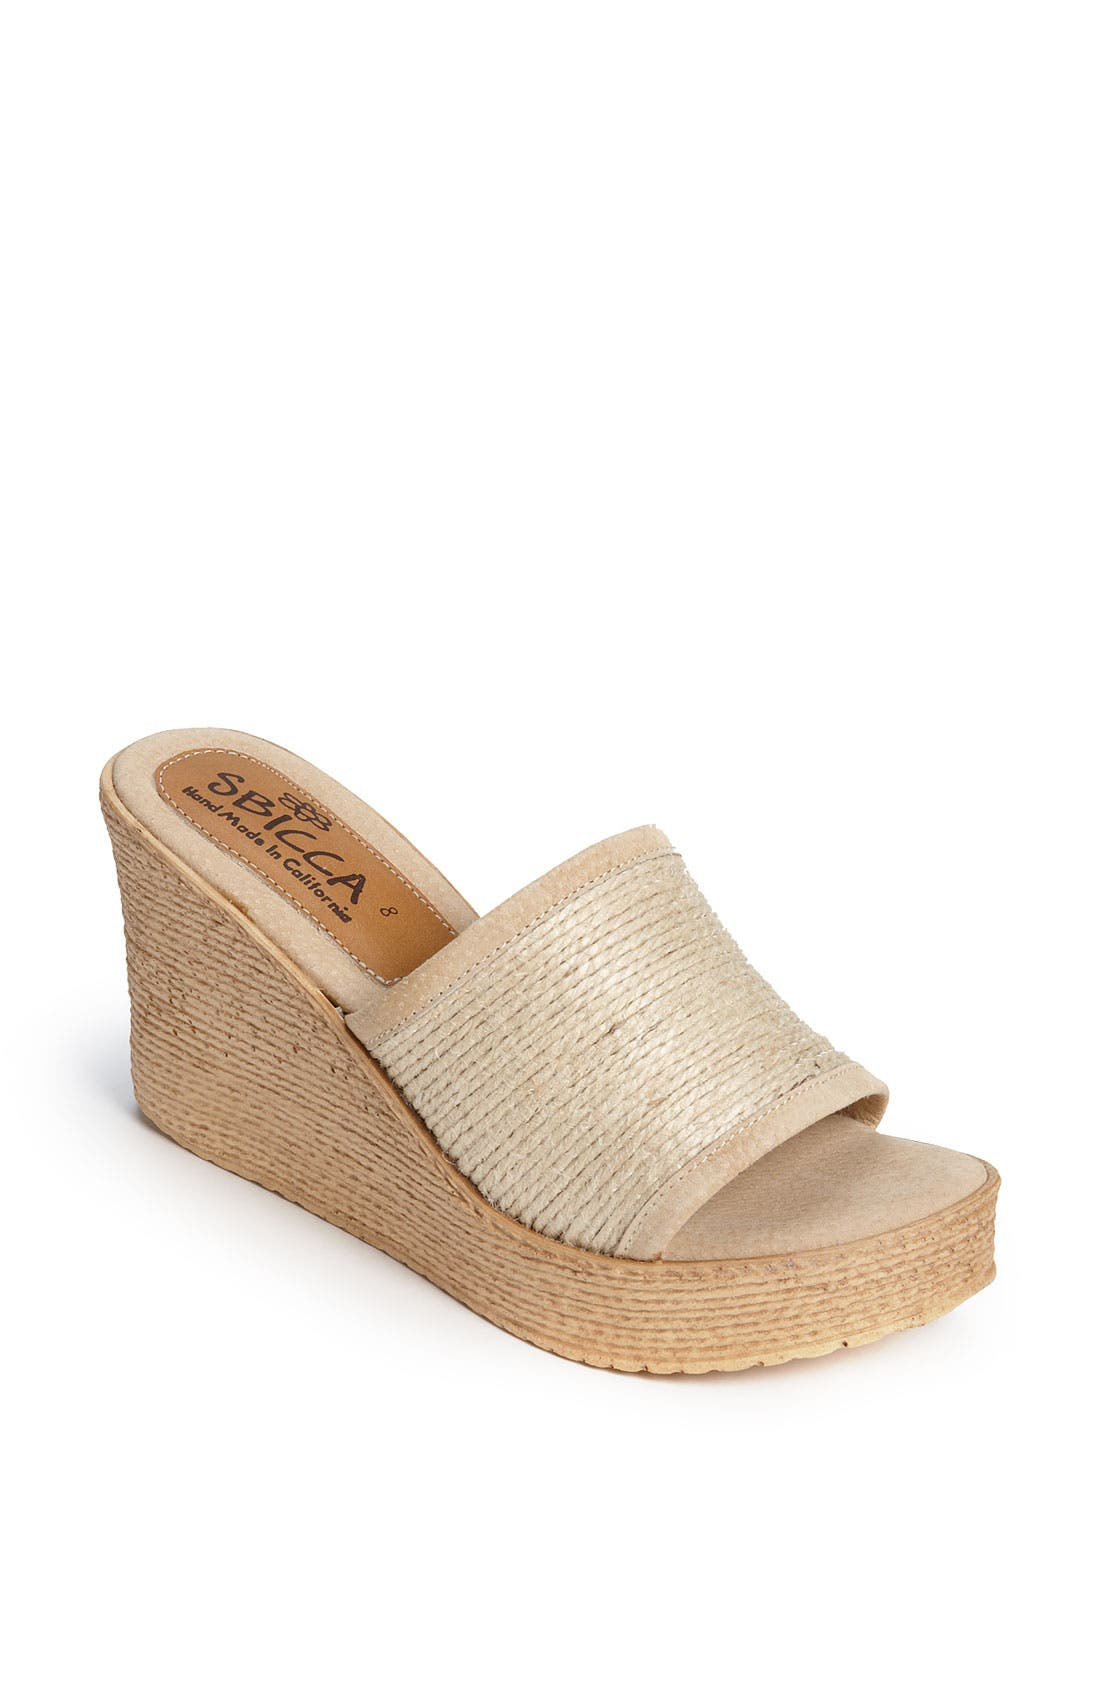 Alternate Image 1 Selected - Sbicca 'Blondie' Sandal